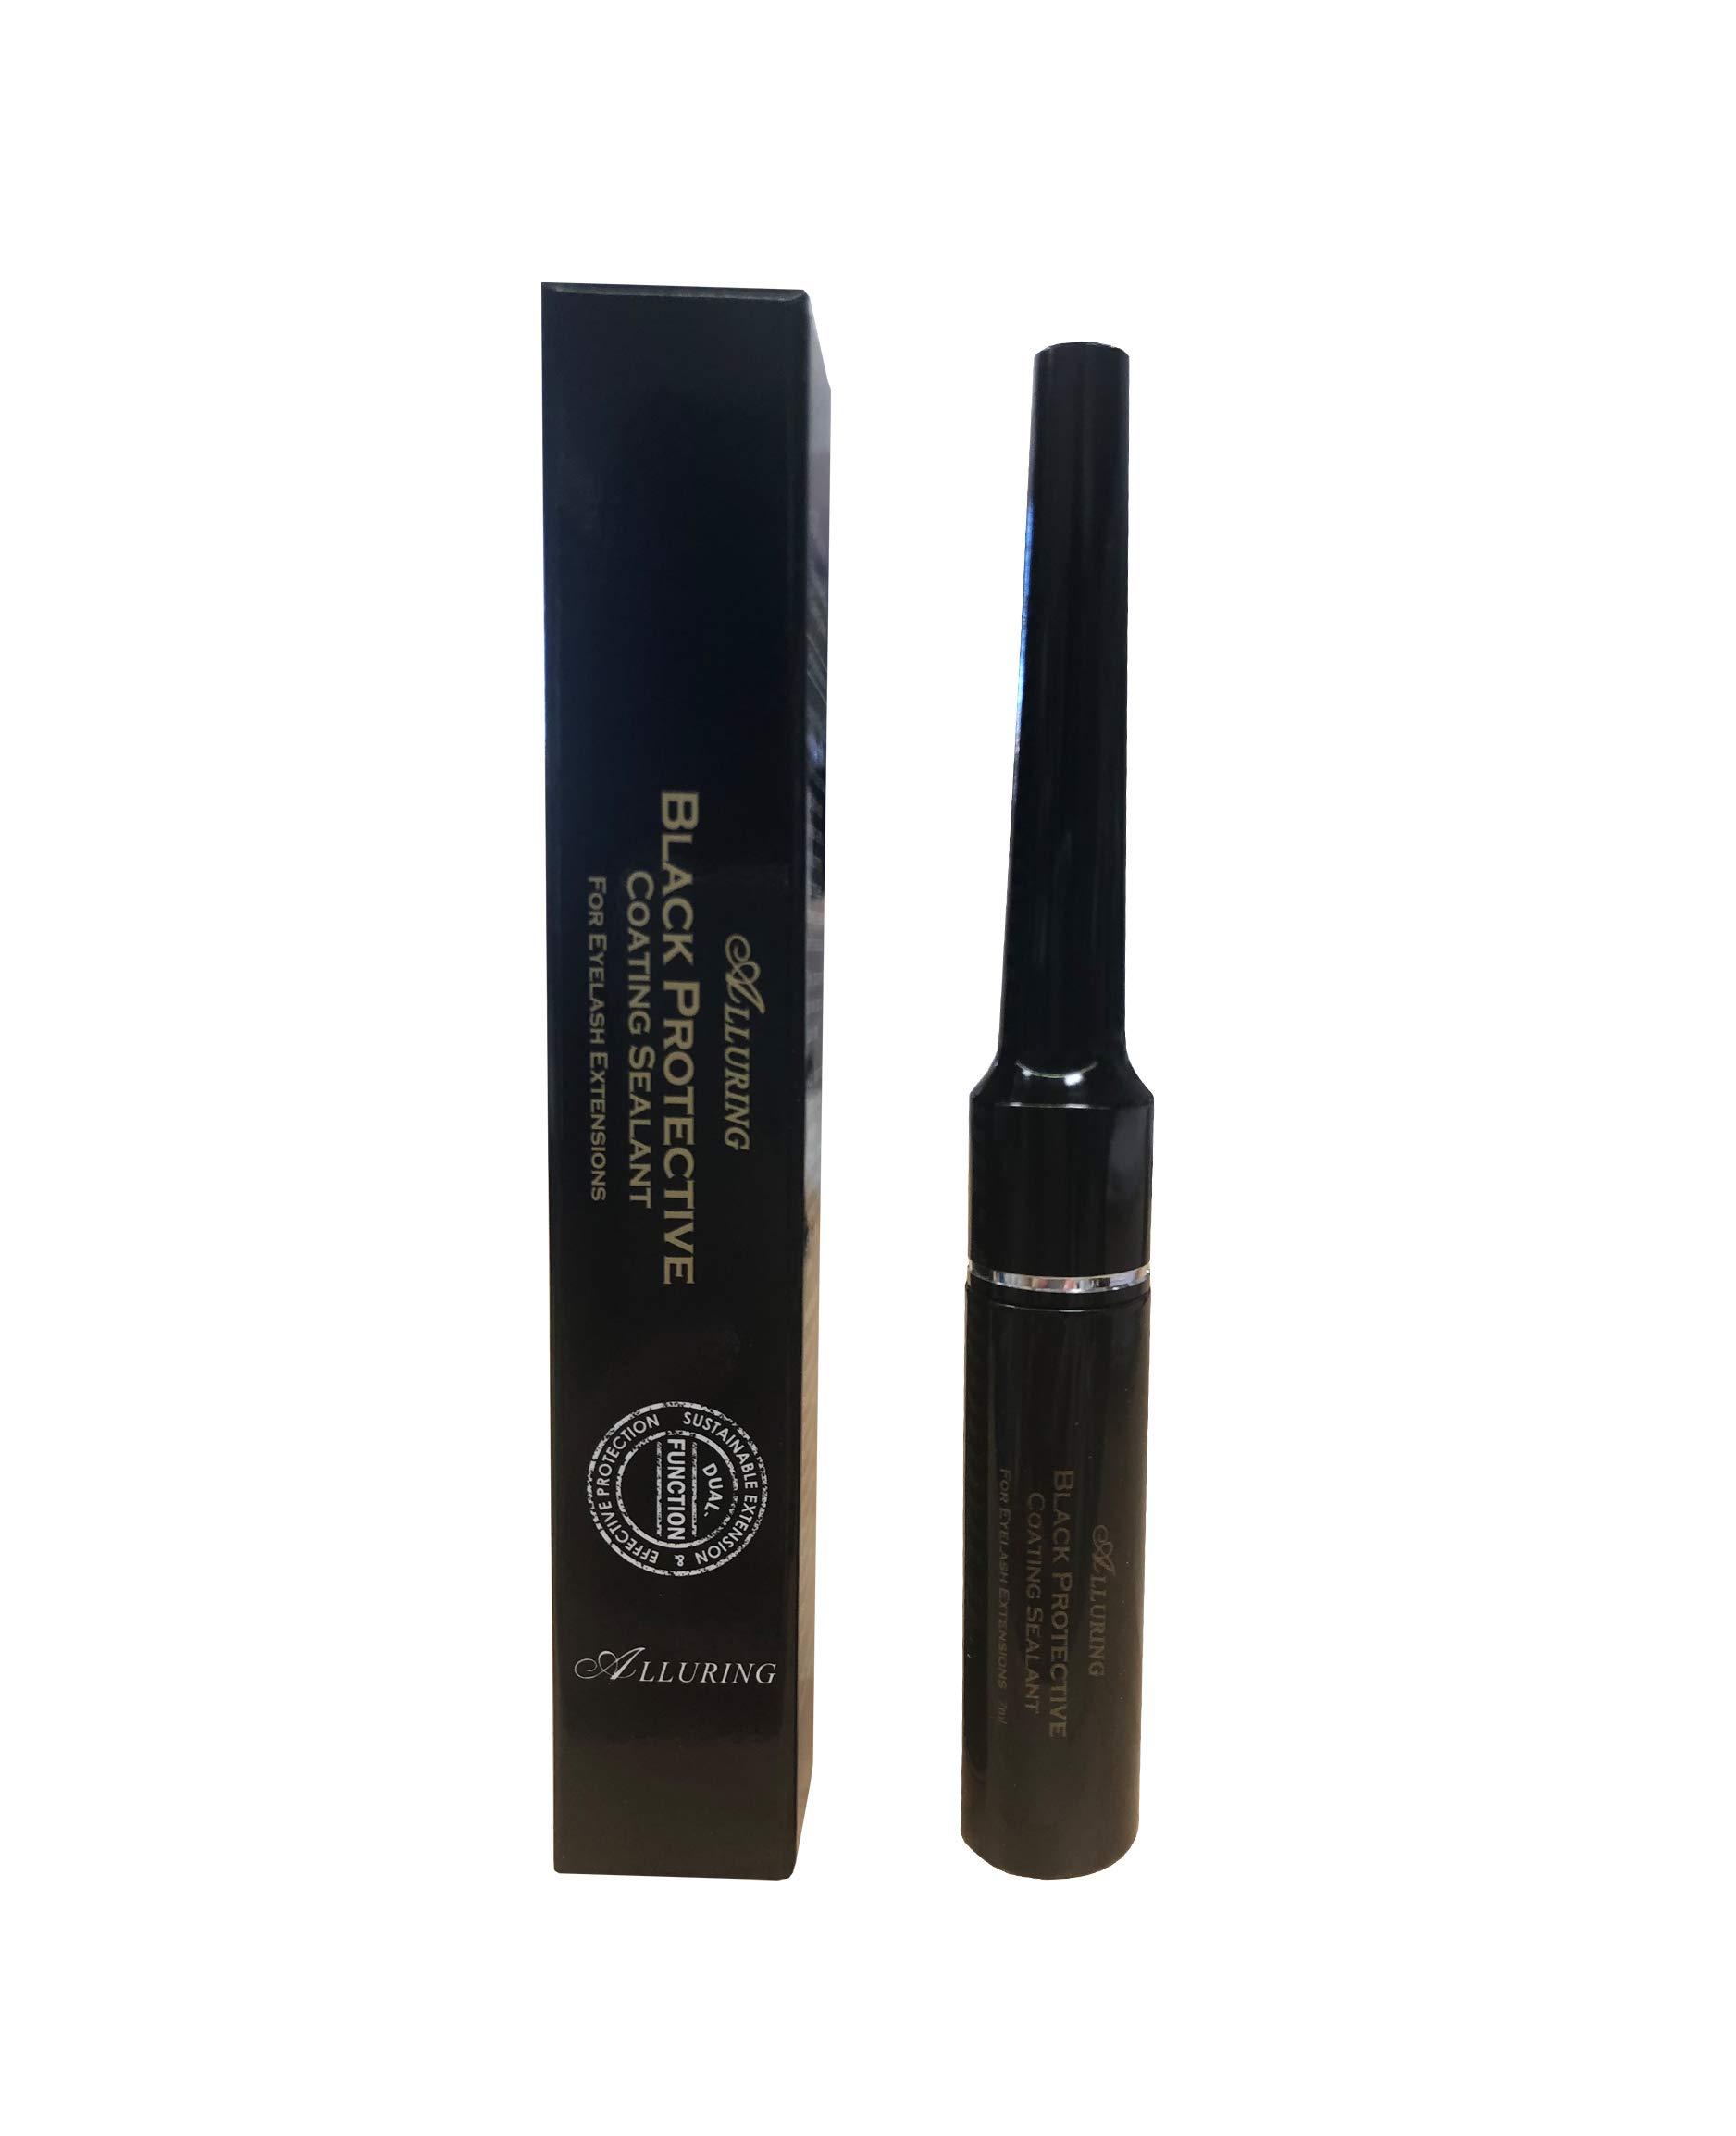 Alluring Coating Sealant Eyelash Extensions